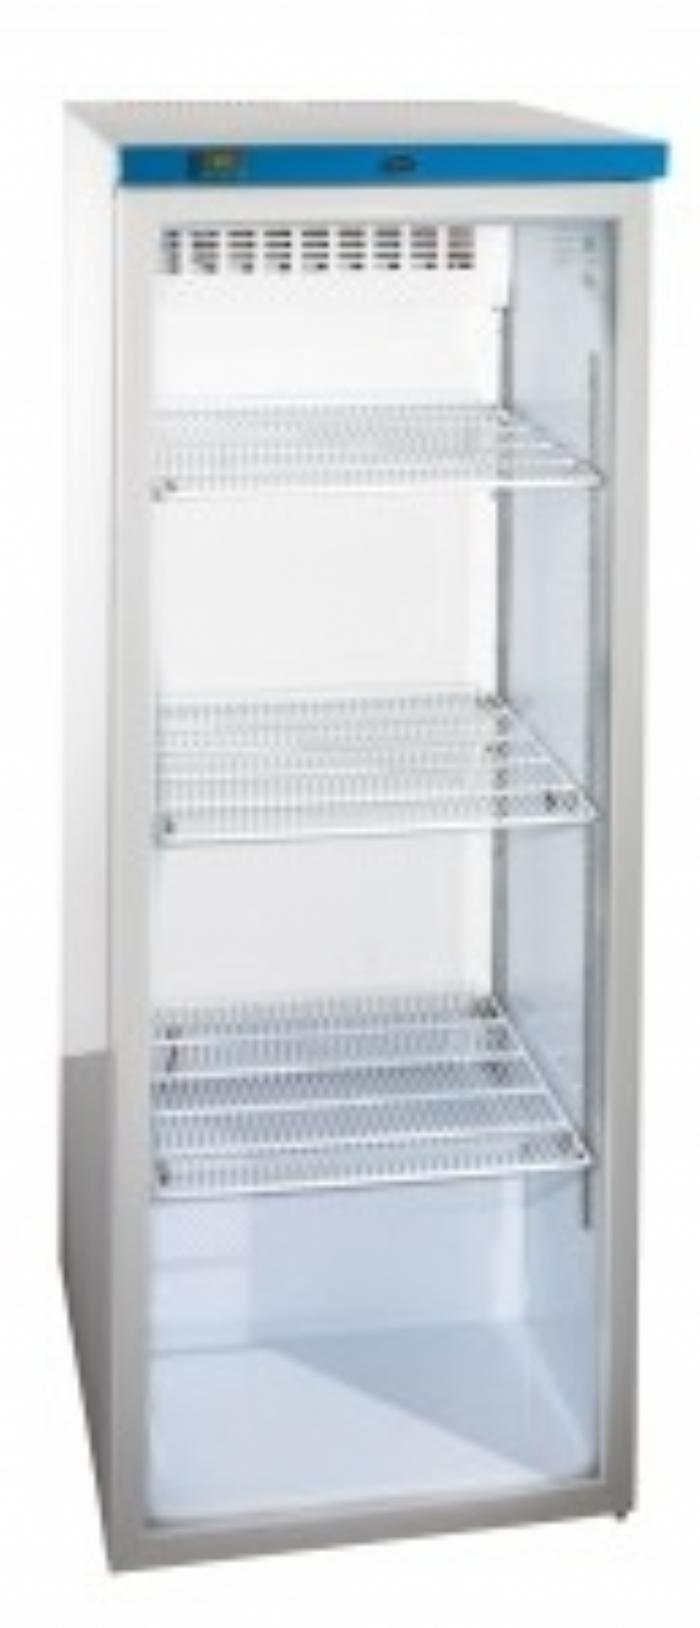 LabCold Cooled Incubator Glass Door 300L RLCG0300